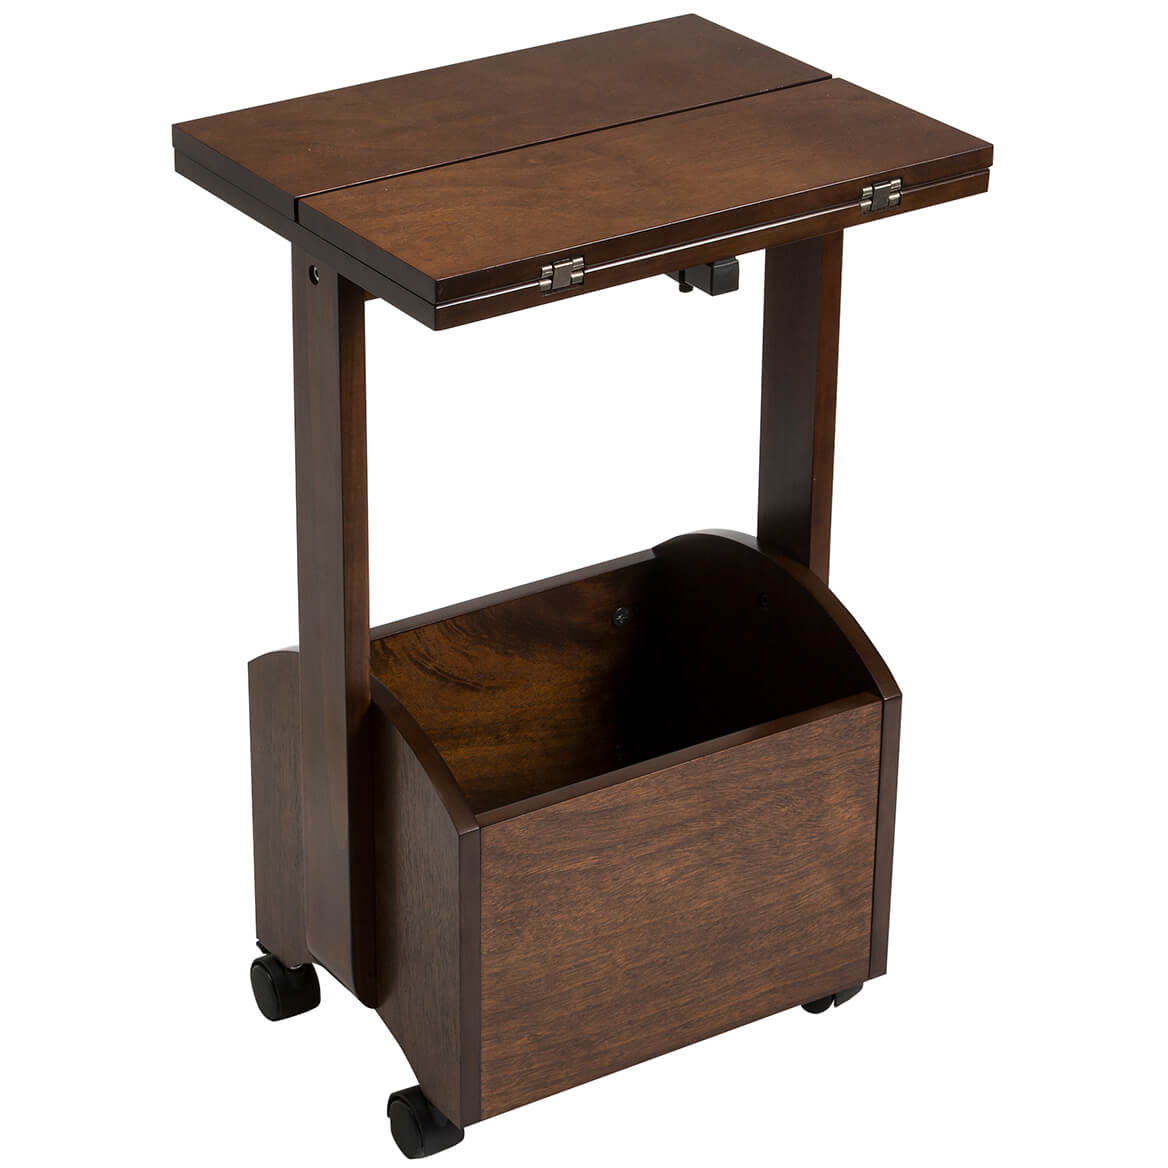 Rolling Folding Side Table By OakRidge™ Accents